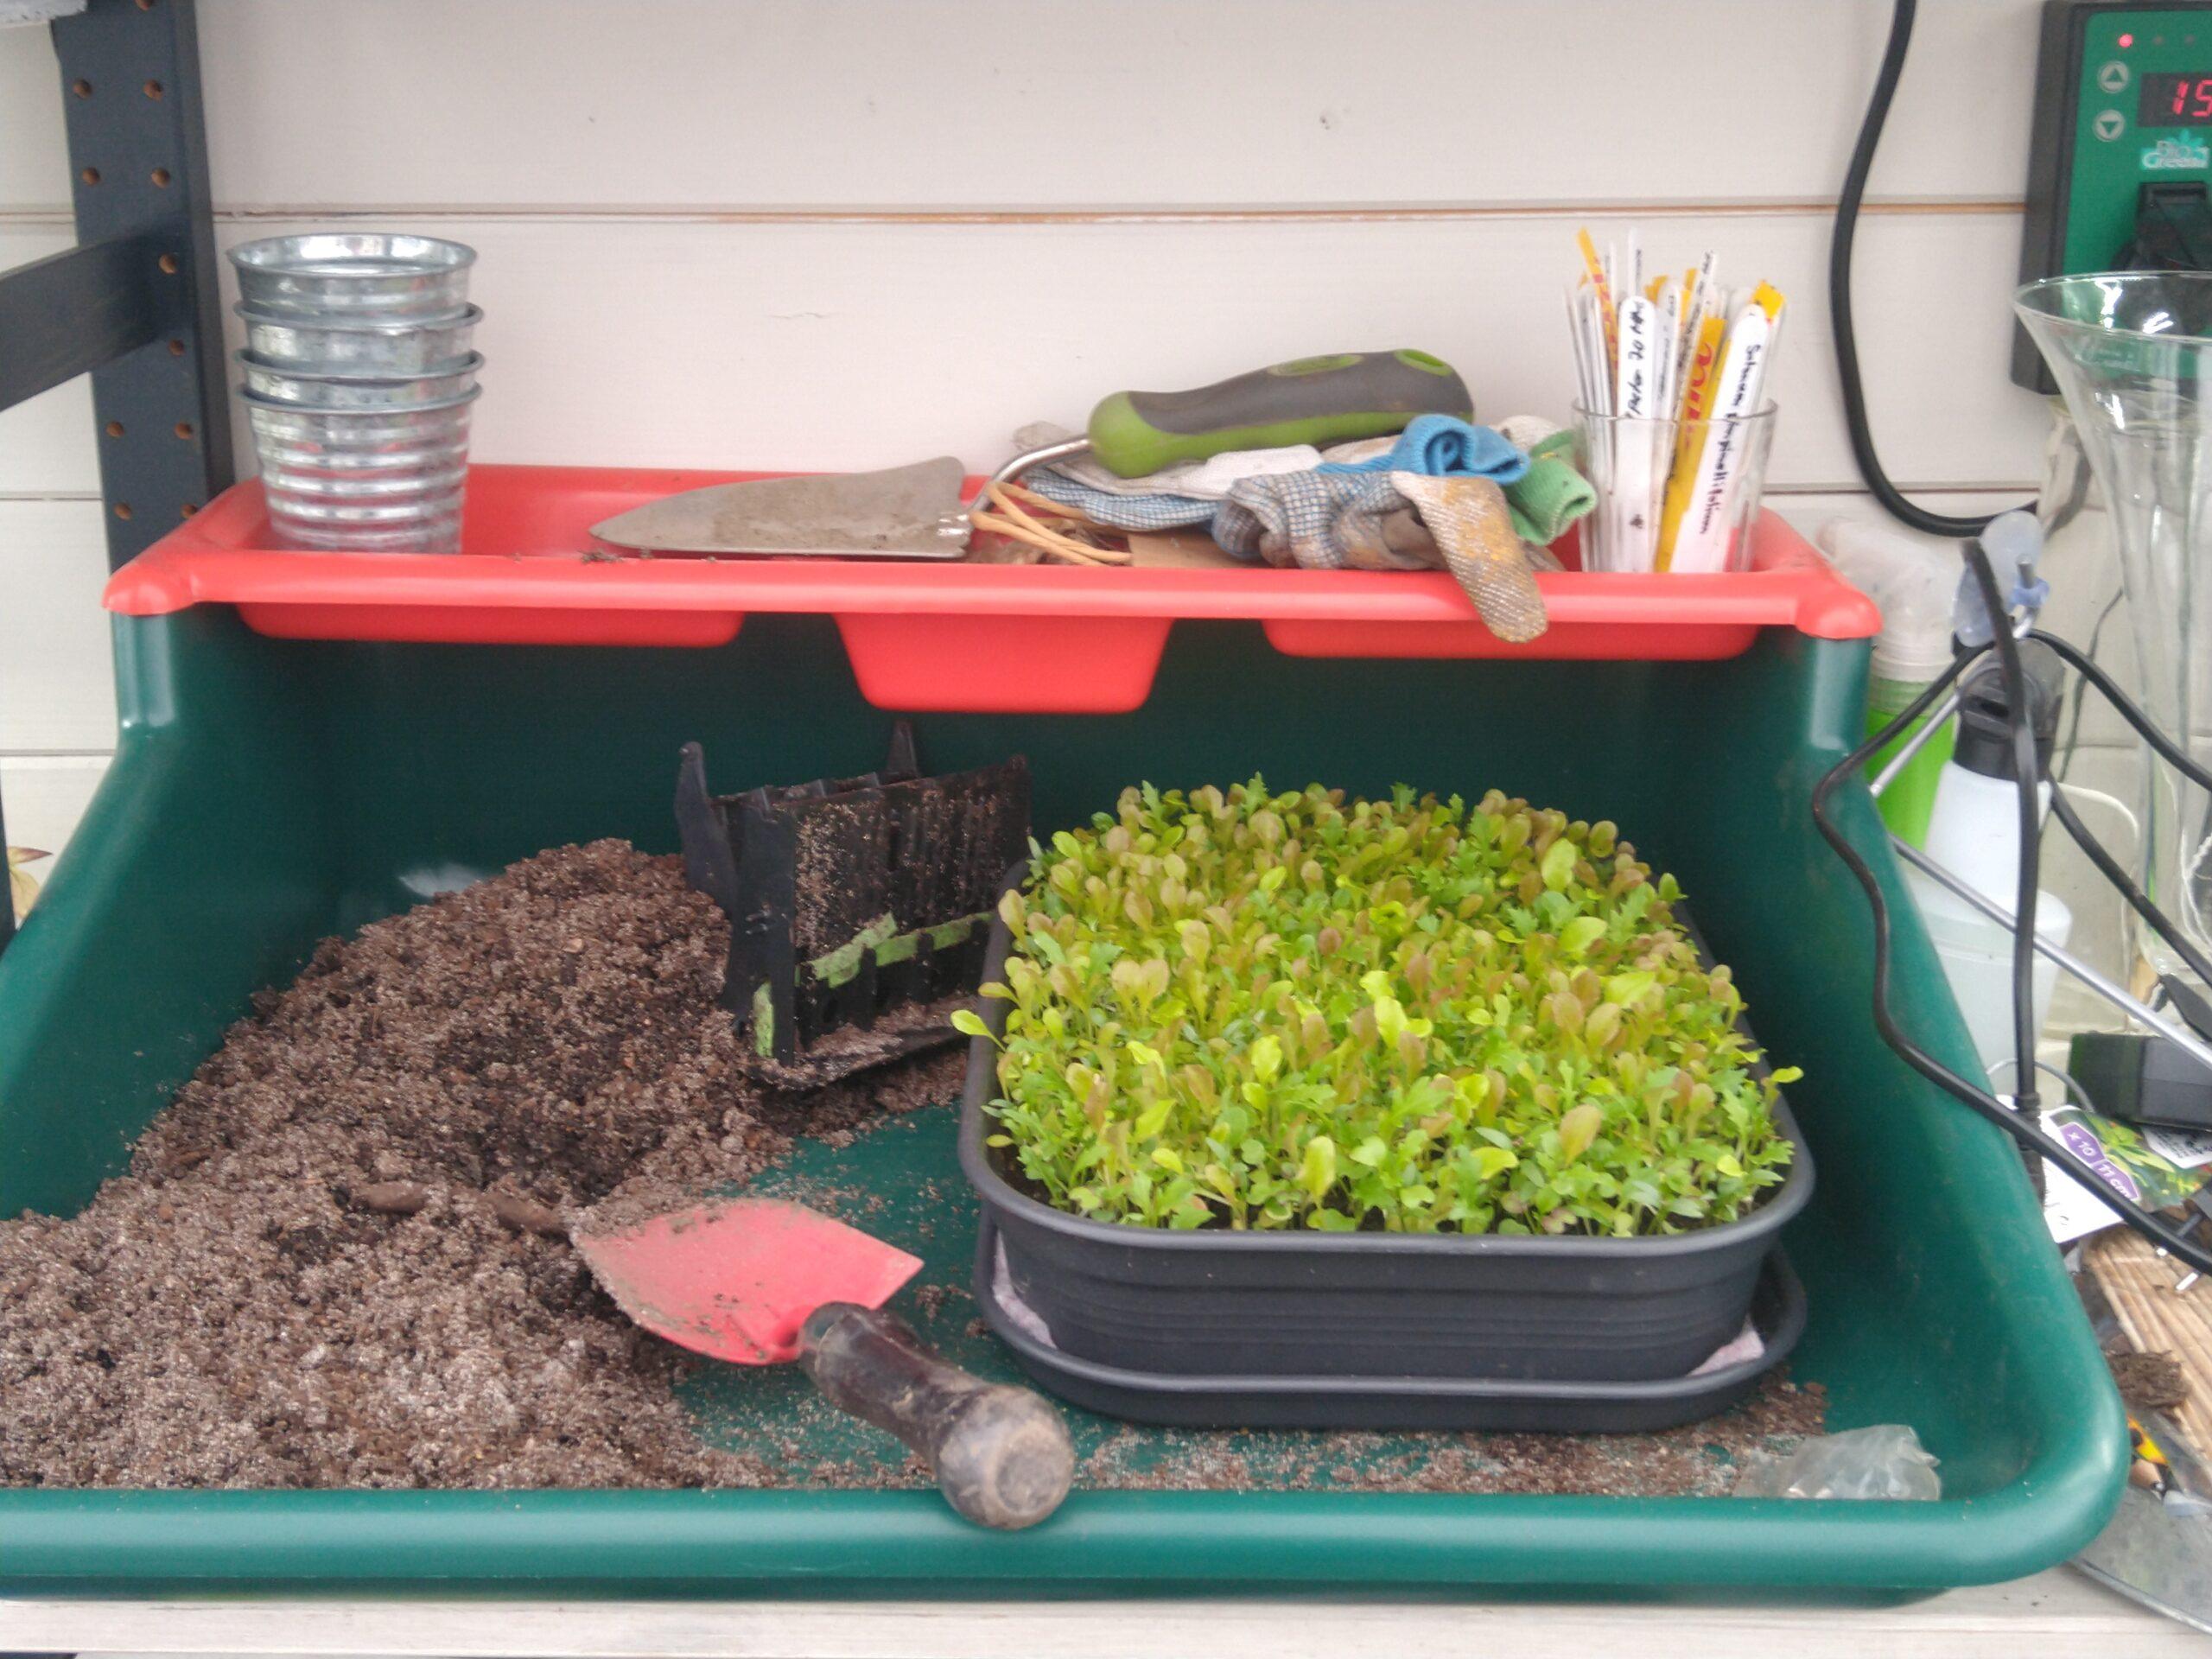 Arbeidsbrettet i drivhuset med salatsådd